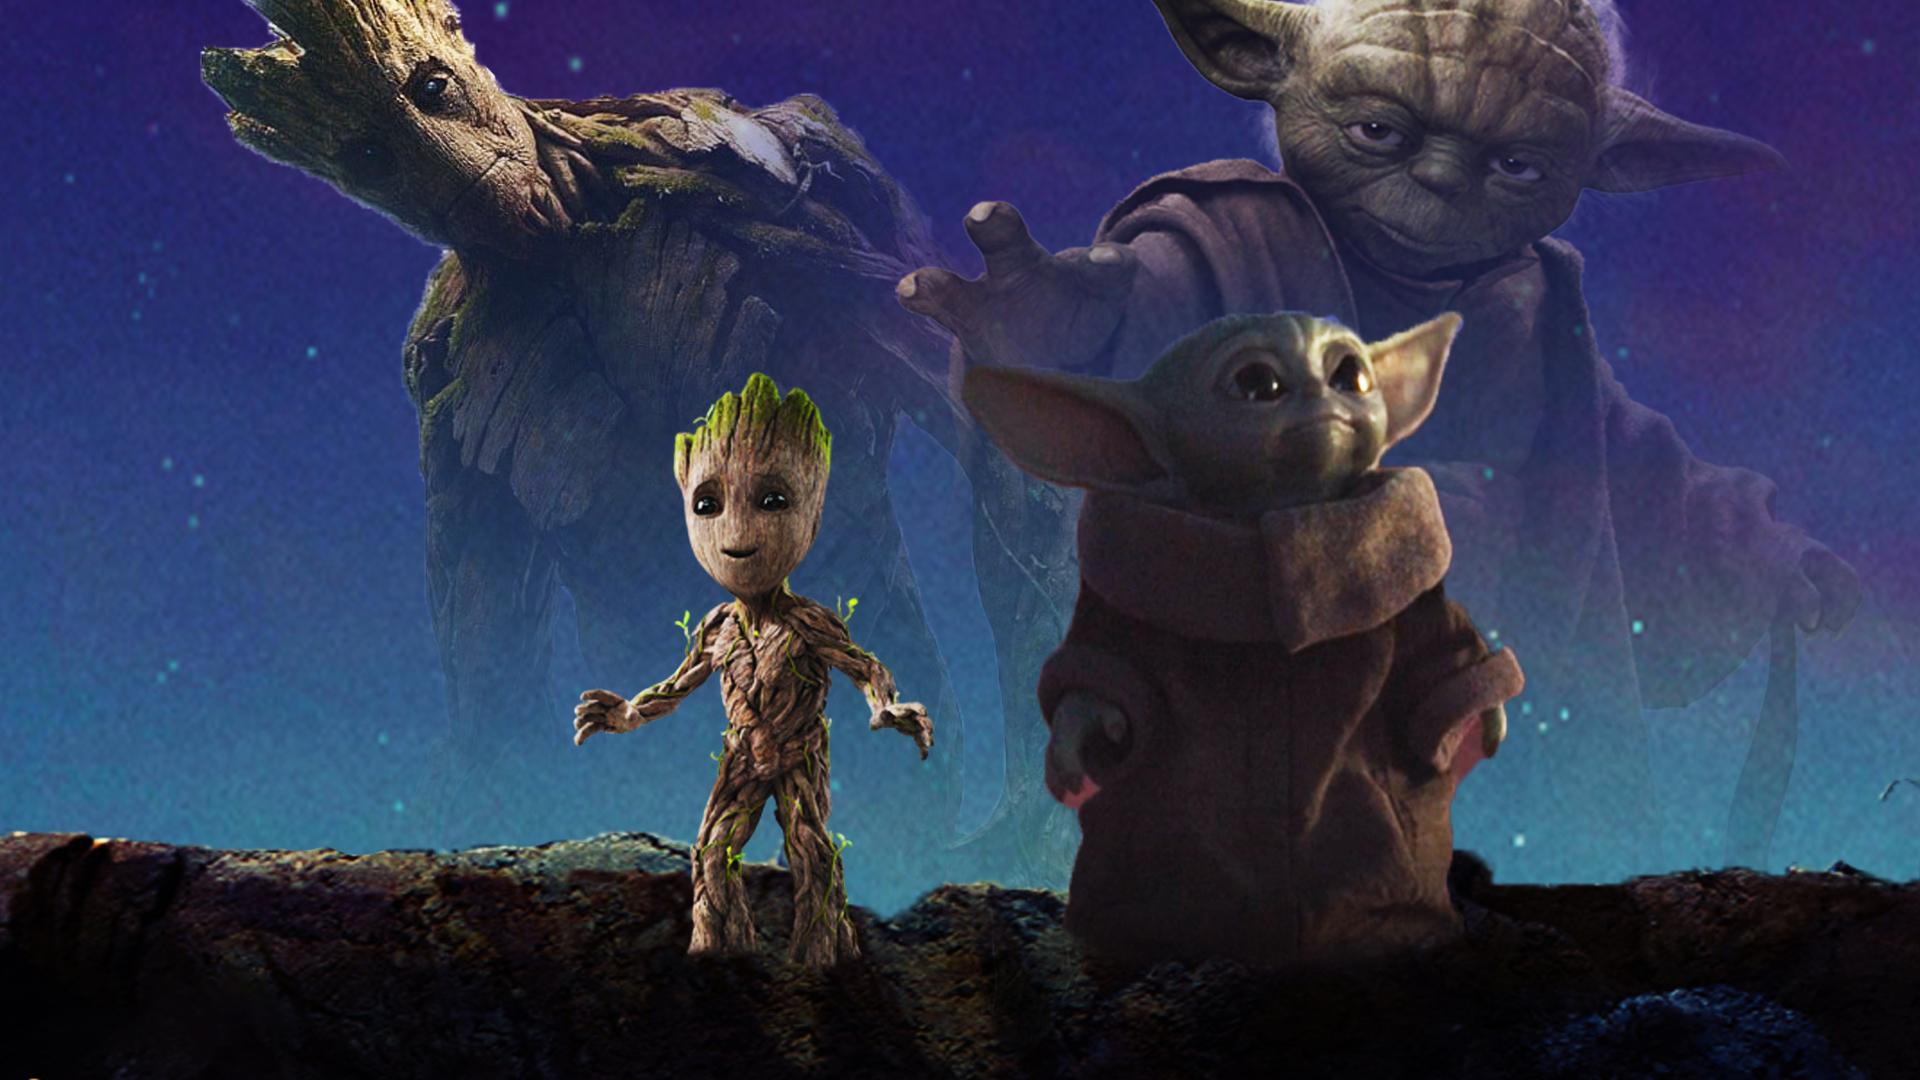 Baby Yoda And Baby Groot Wallpaper By The Dark Mamba 995 On